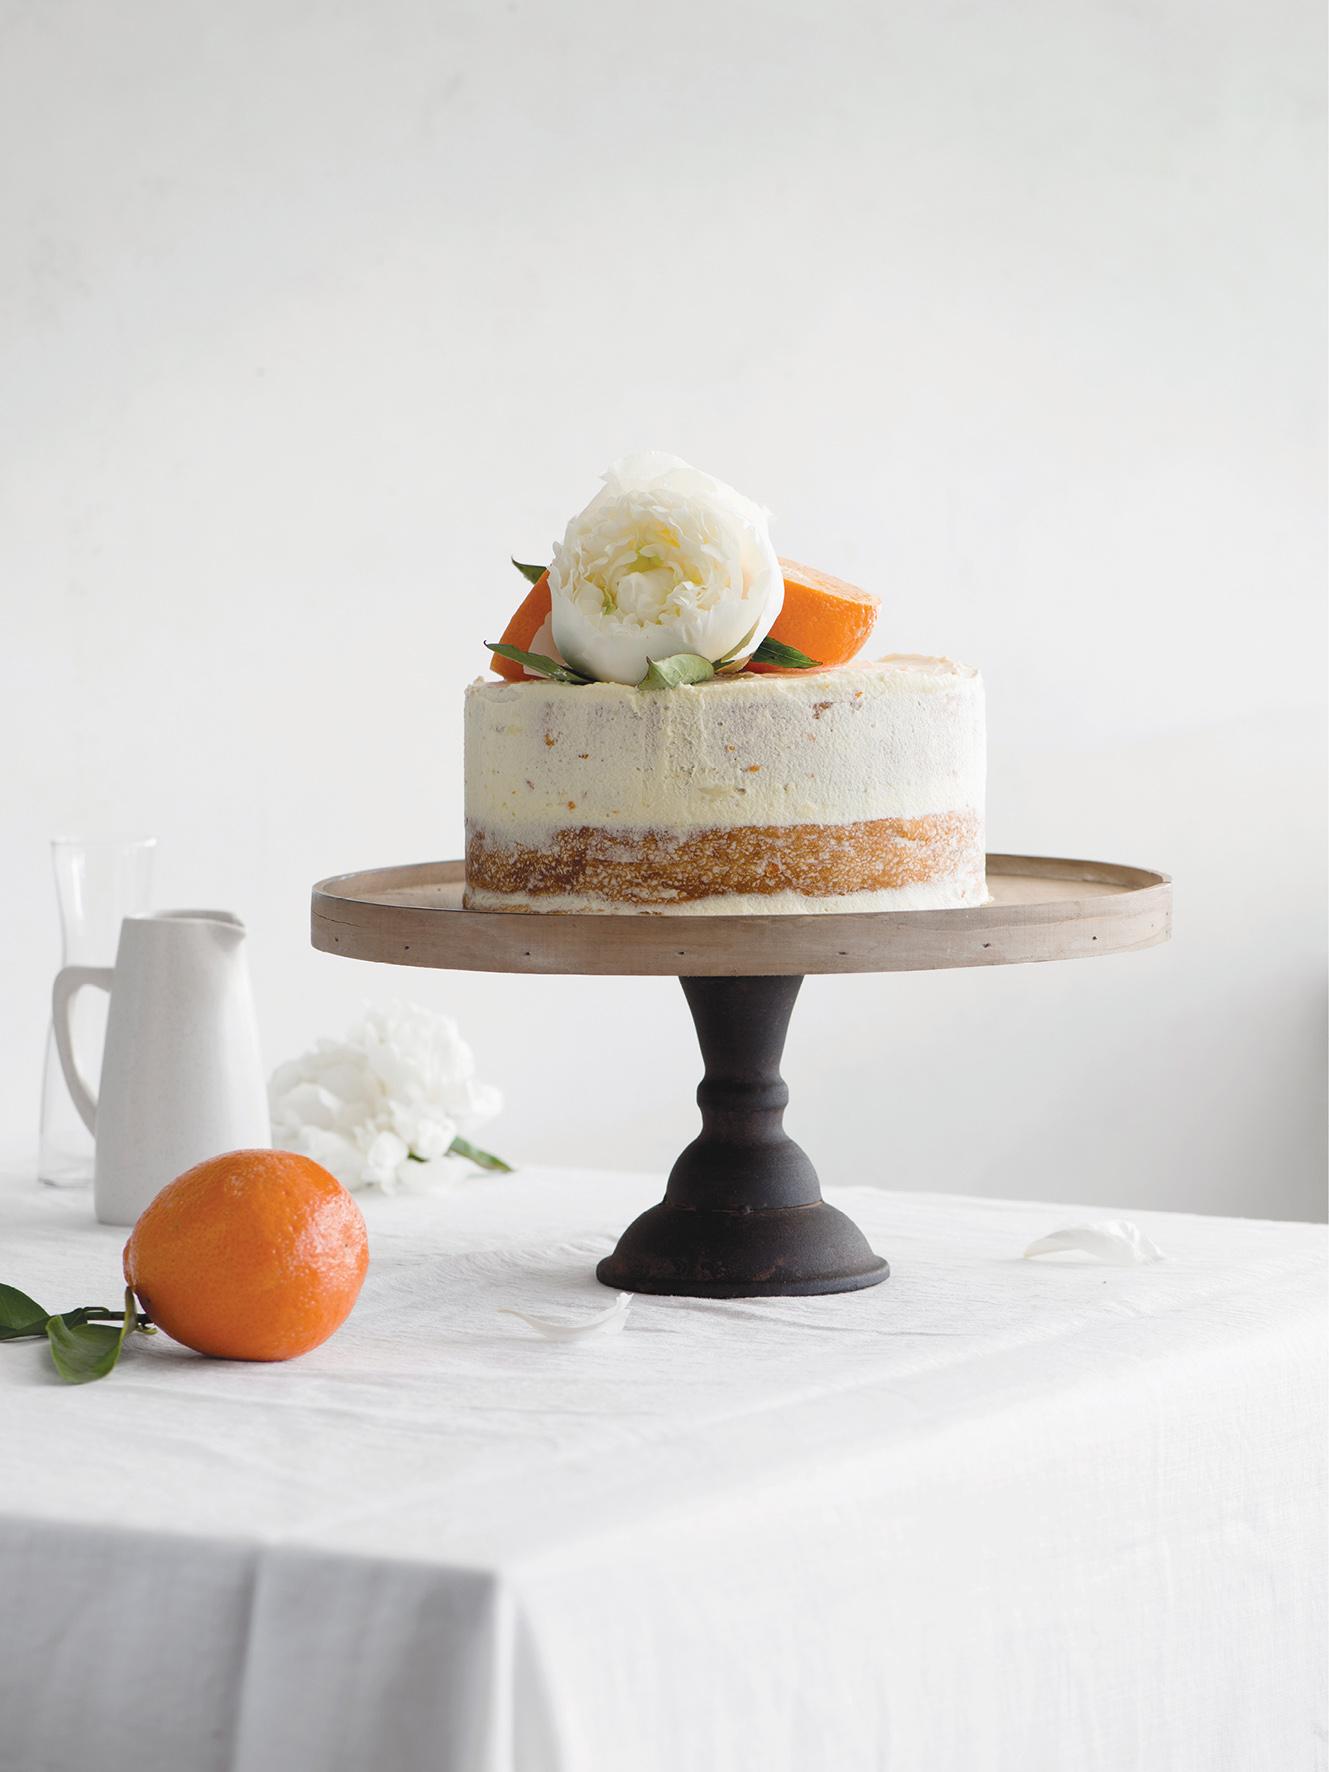 tangelo wattleseed cake